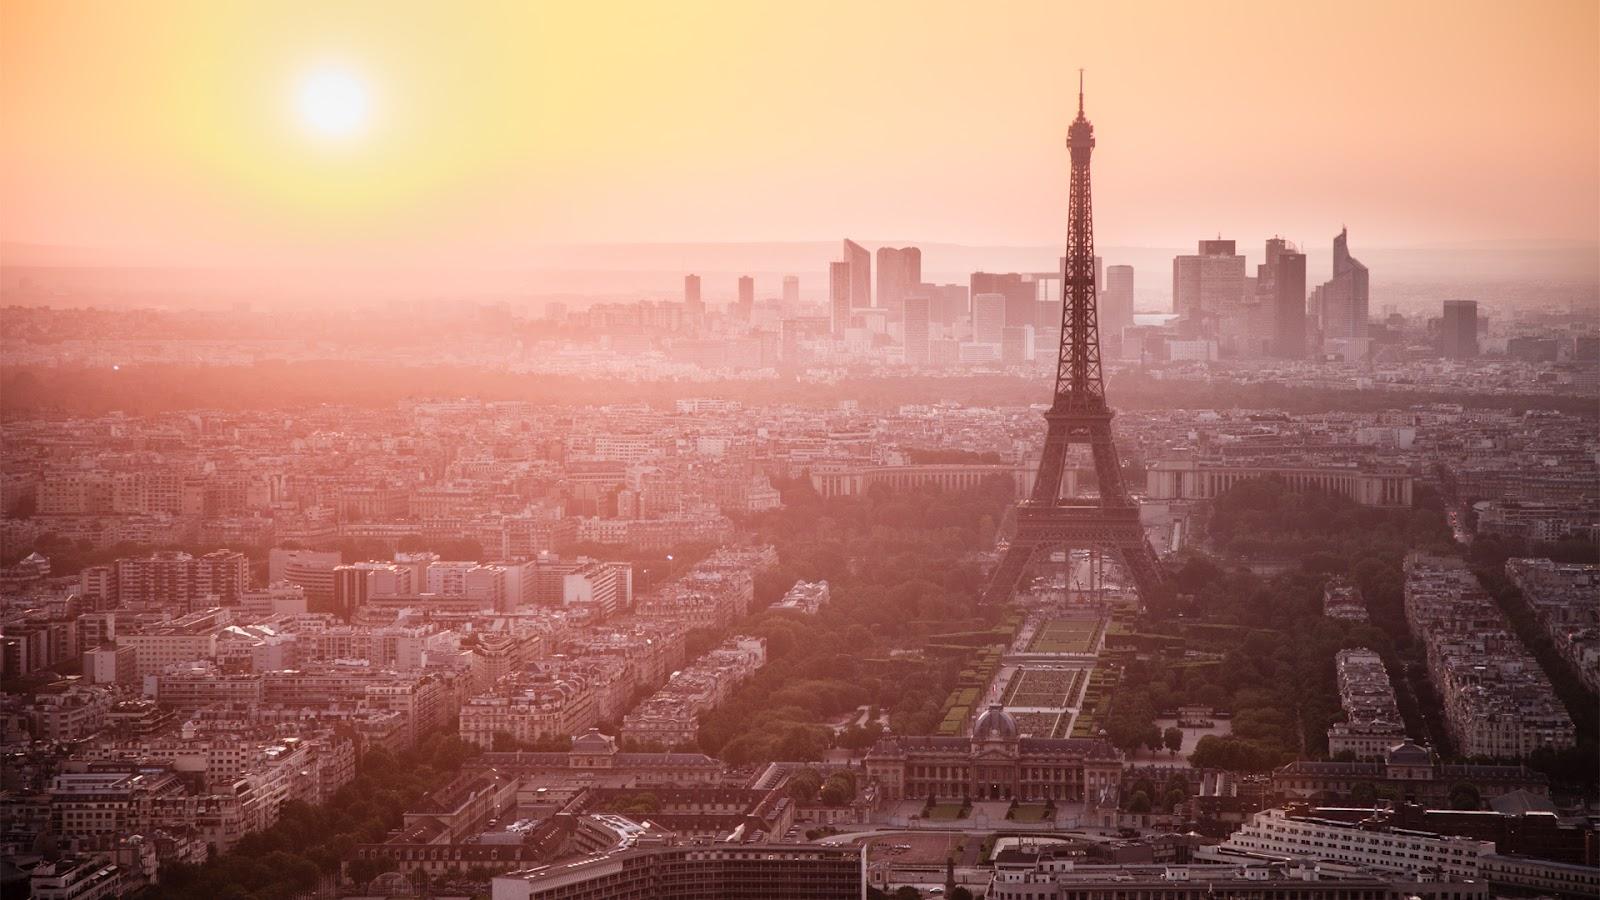 Eiffel Tower HD Desktop Wallpapers | Desktop Wallpapers